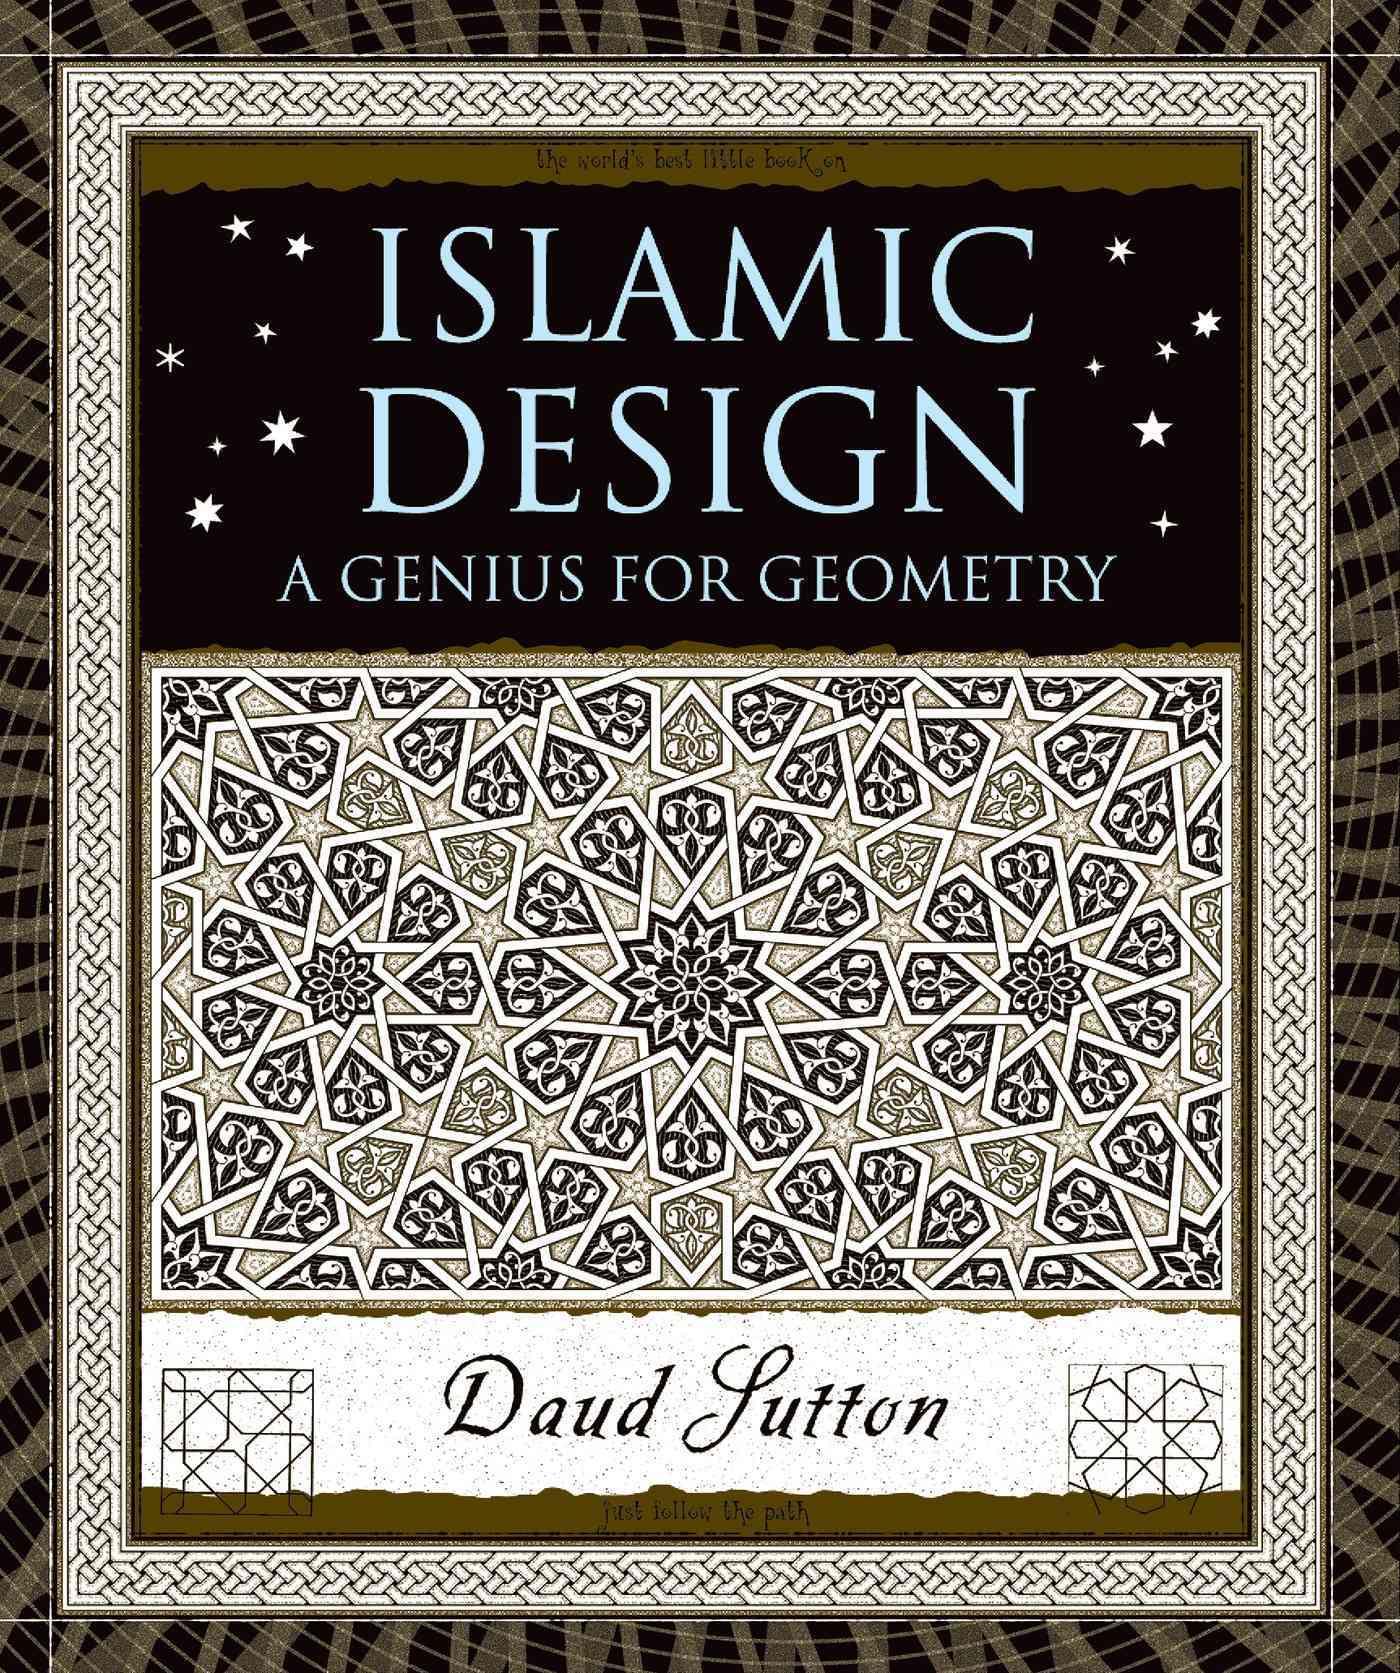 Islamic Design By Sutton, Daud